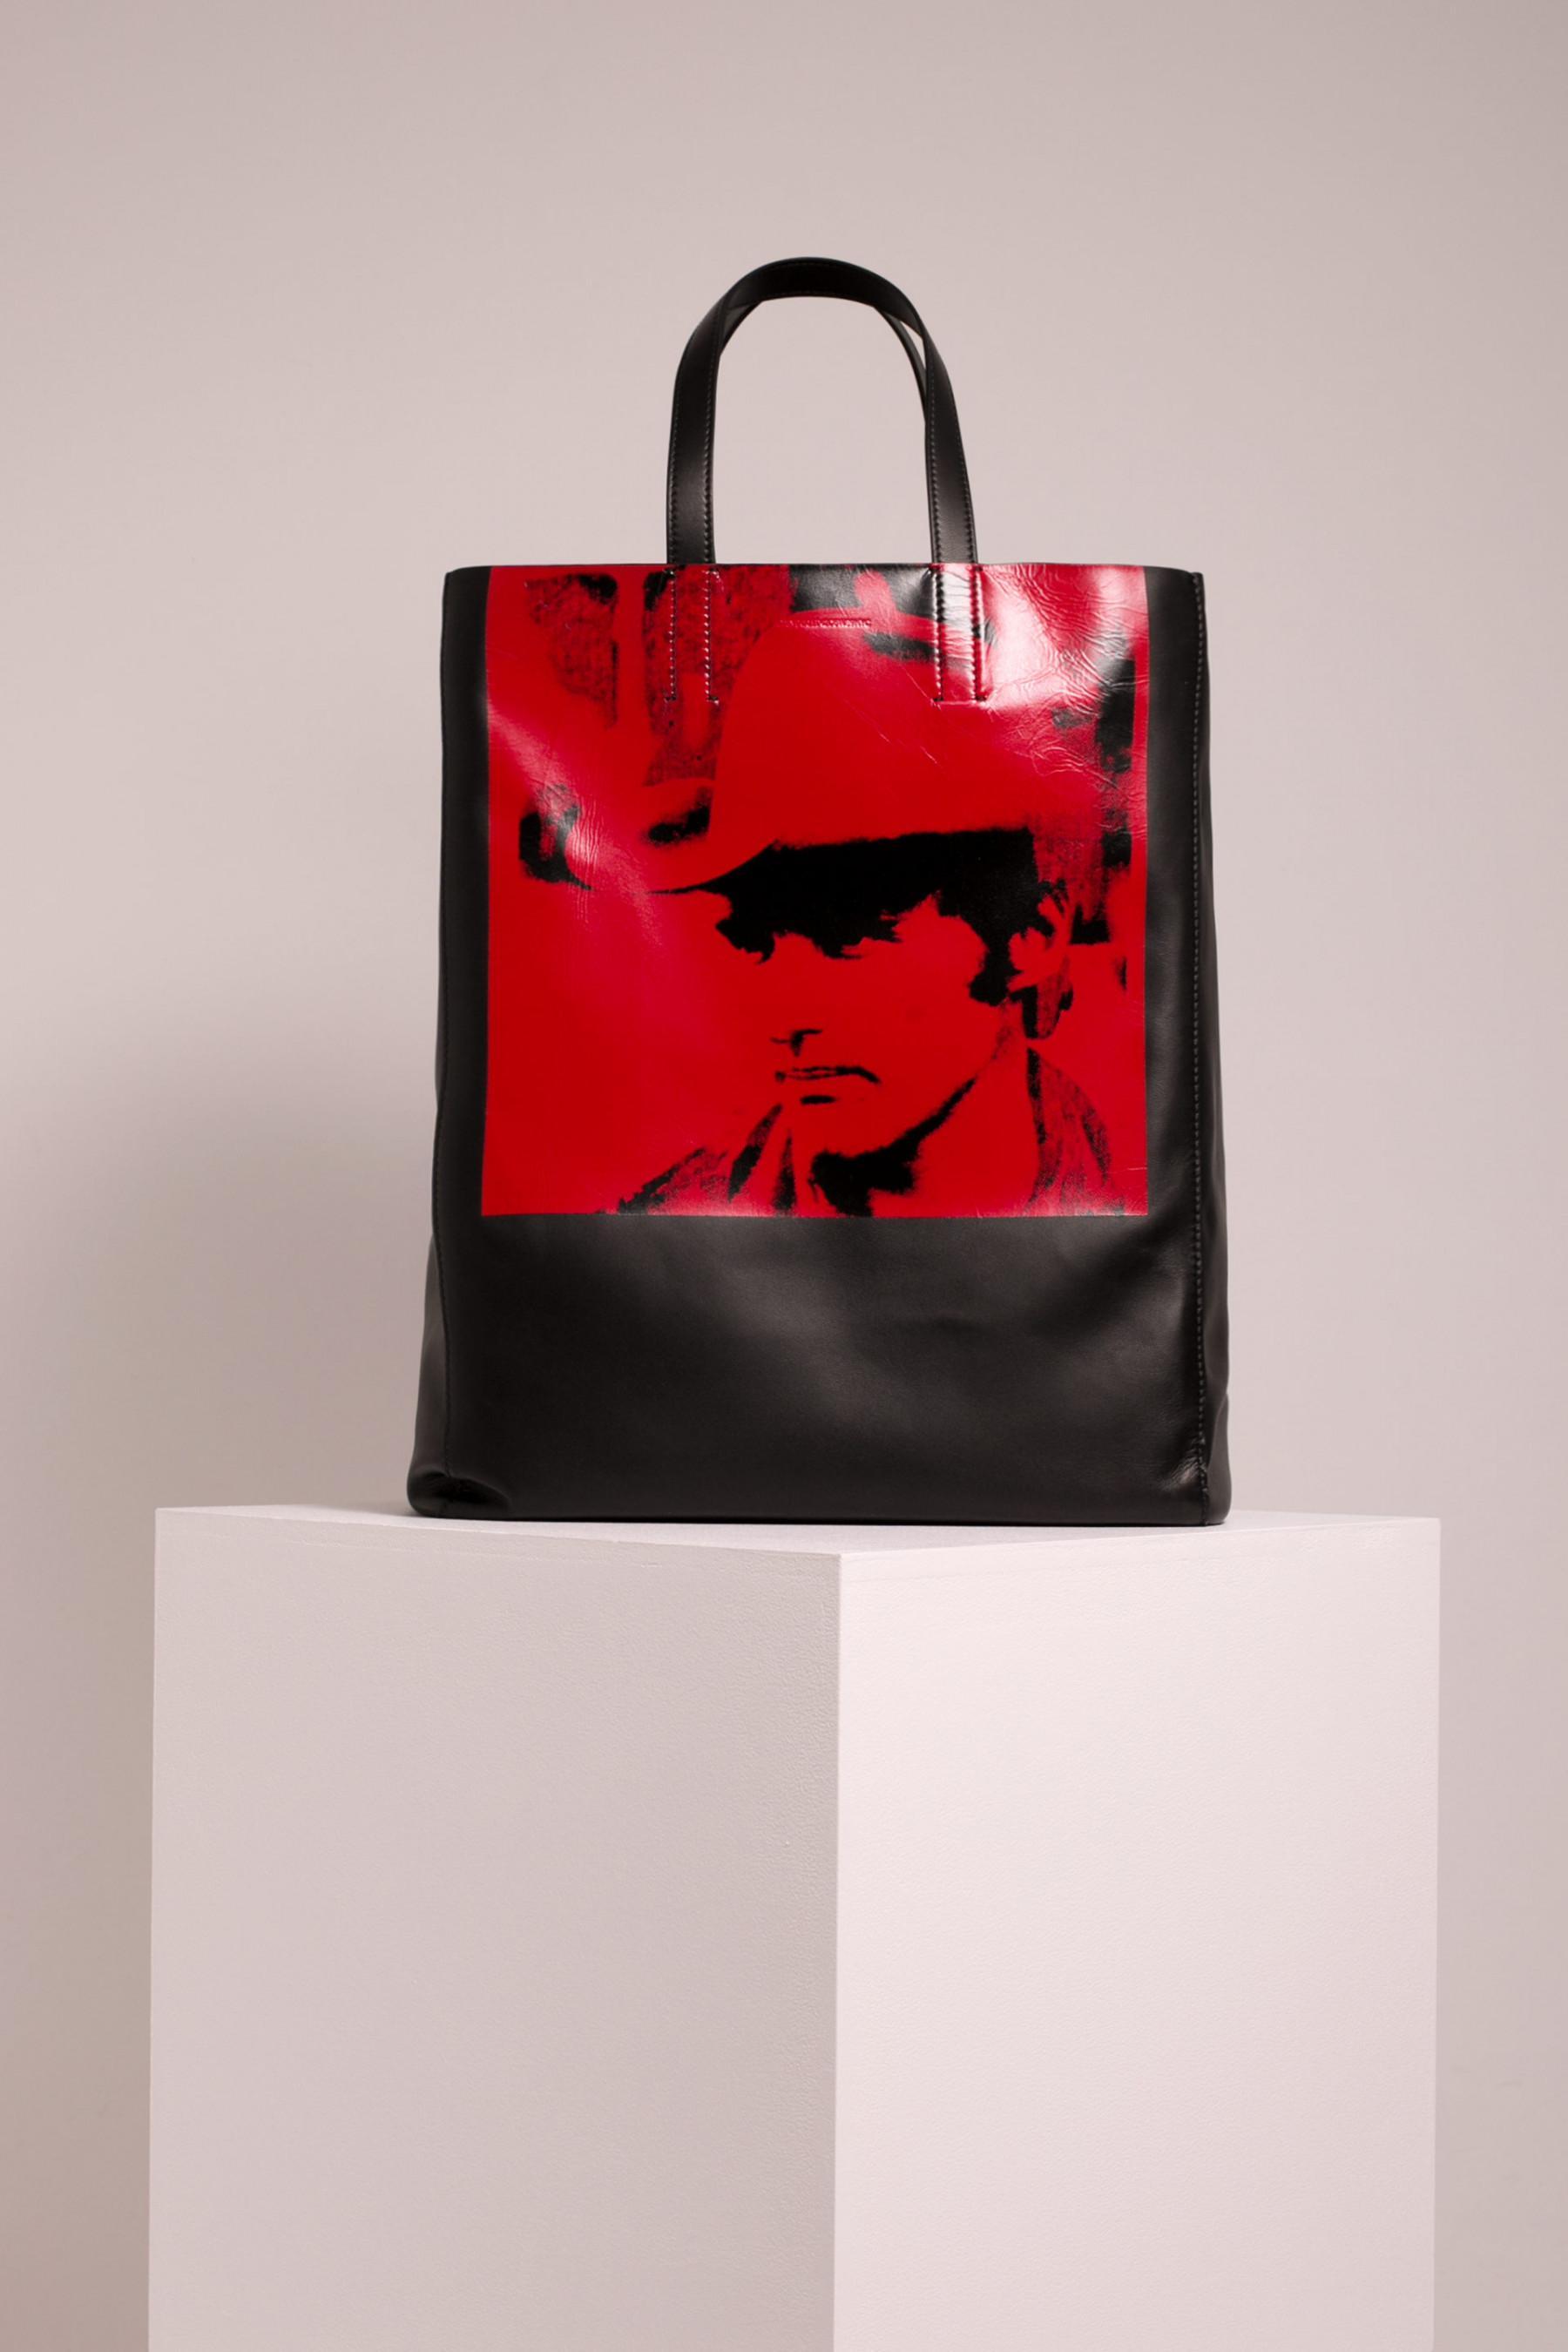 Dennis Sac Fourre-tout De La Trémie - Noir Calvin Klein 205w39nyc dBGFjo5ey